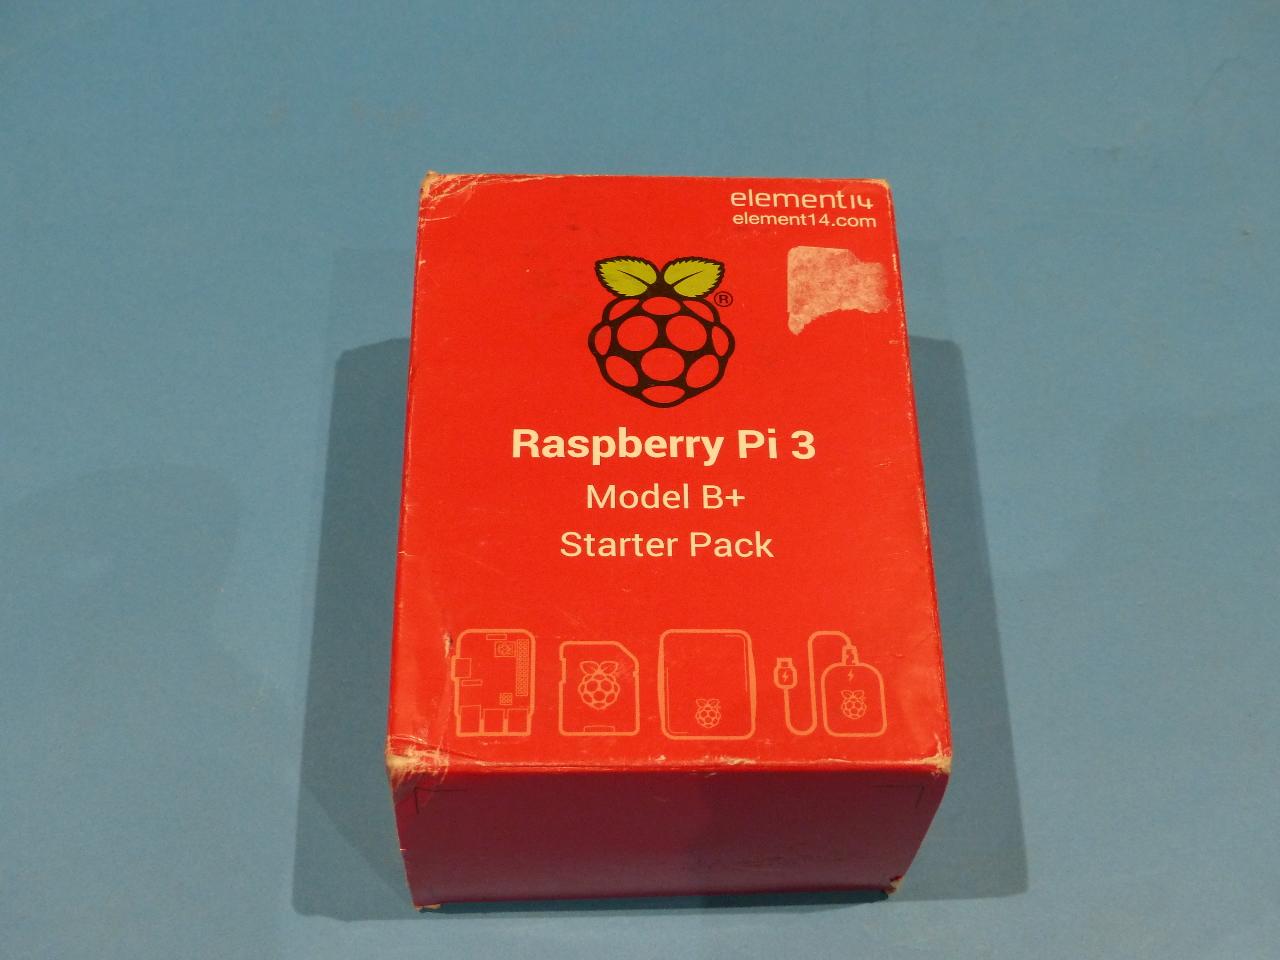 ELEMENT14 RASPBERRY PI 3 MODEL B+ STARTER PACK / QUAD CORE 64 BIT PROCESSOR